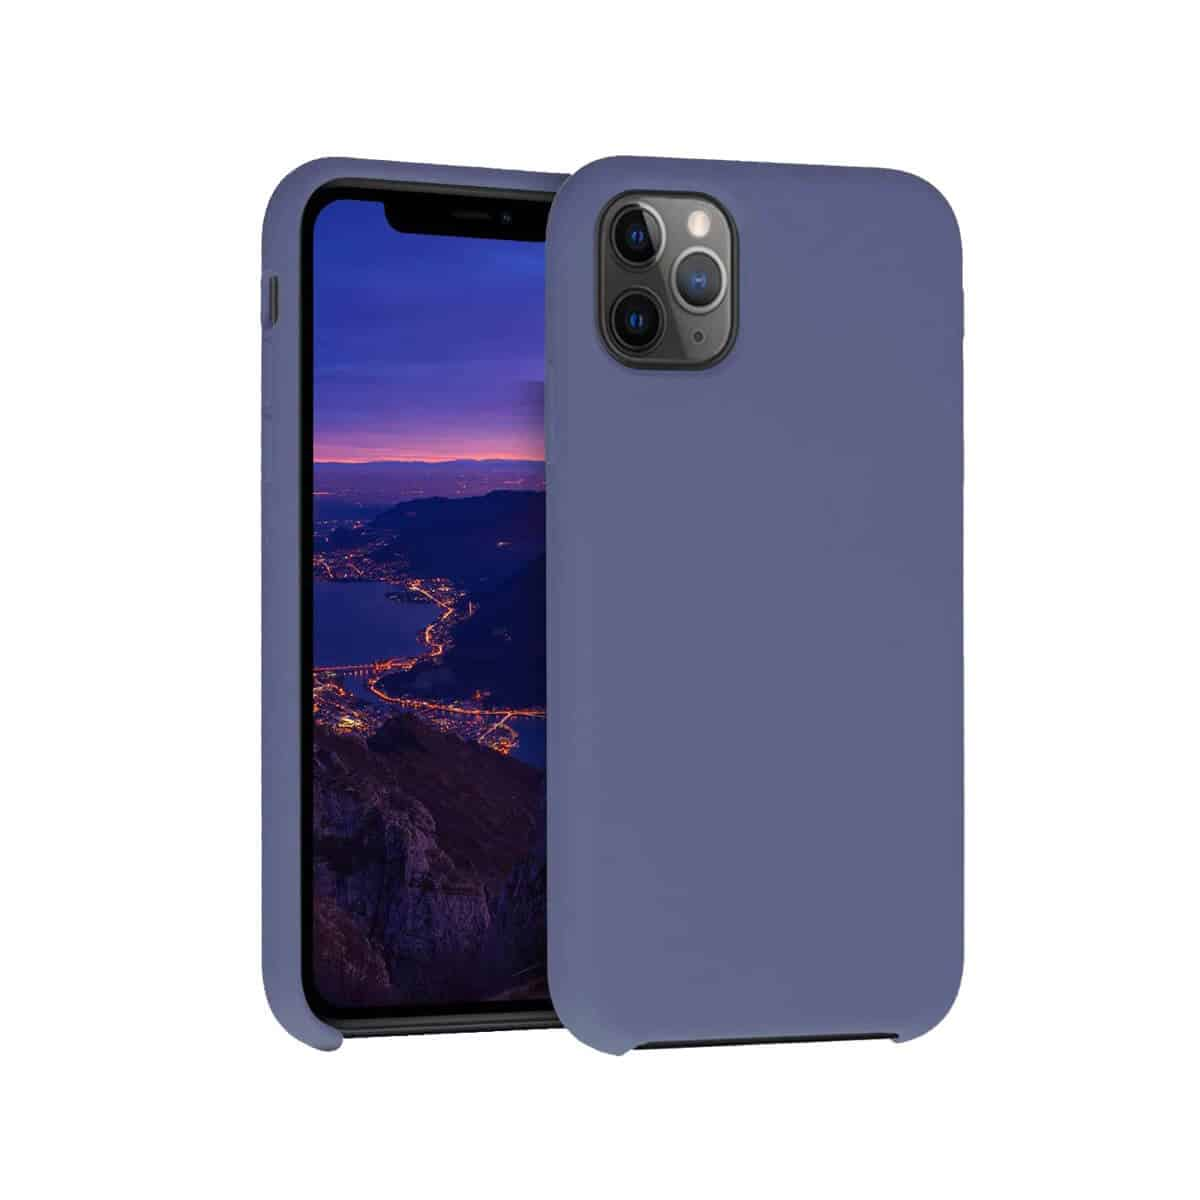 carcasa-edman-pentru-iphone-11-pro-max-albastru-navy-blue